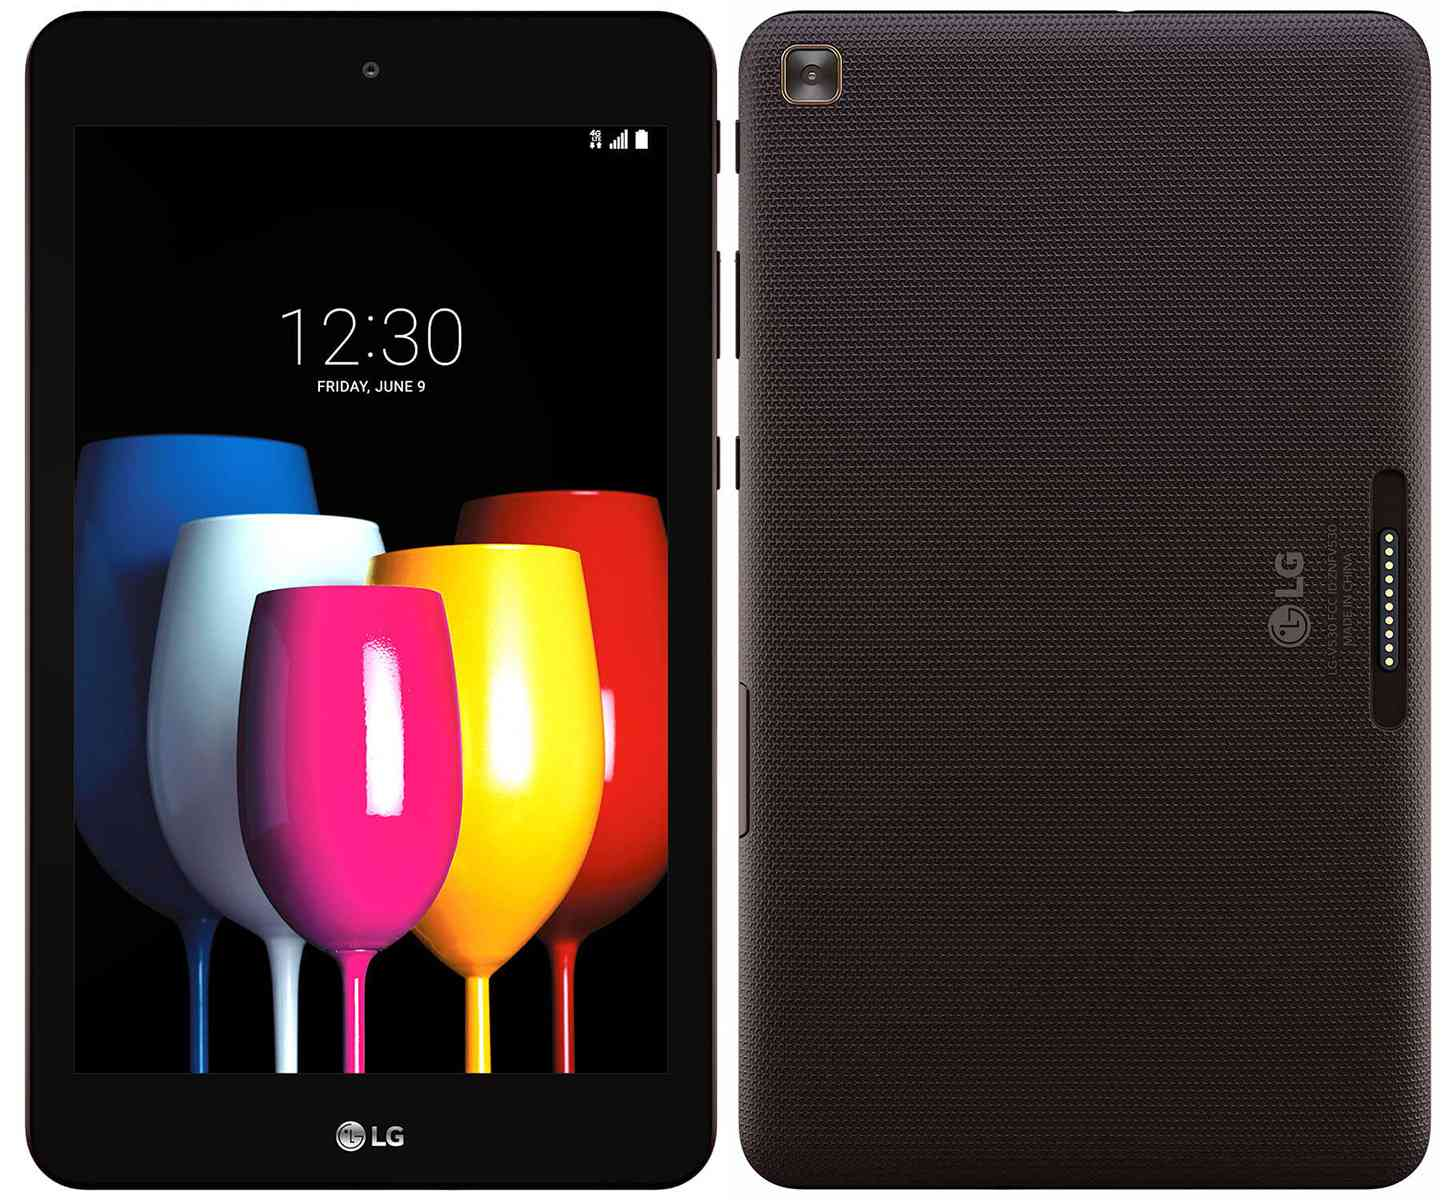 LG G Pad X2 8.0 Plus T-Mobile official